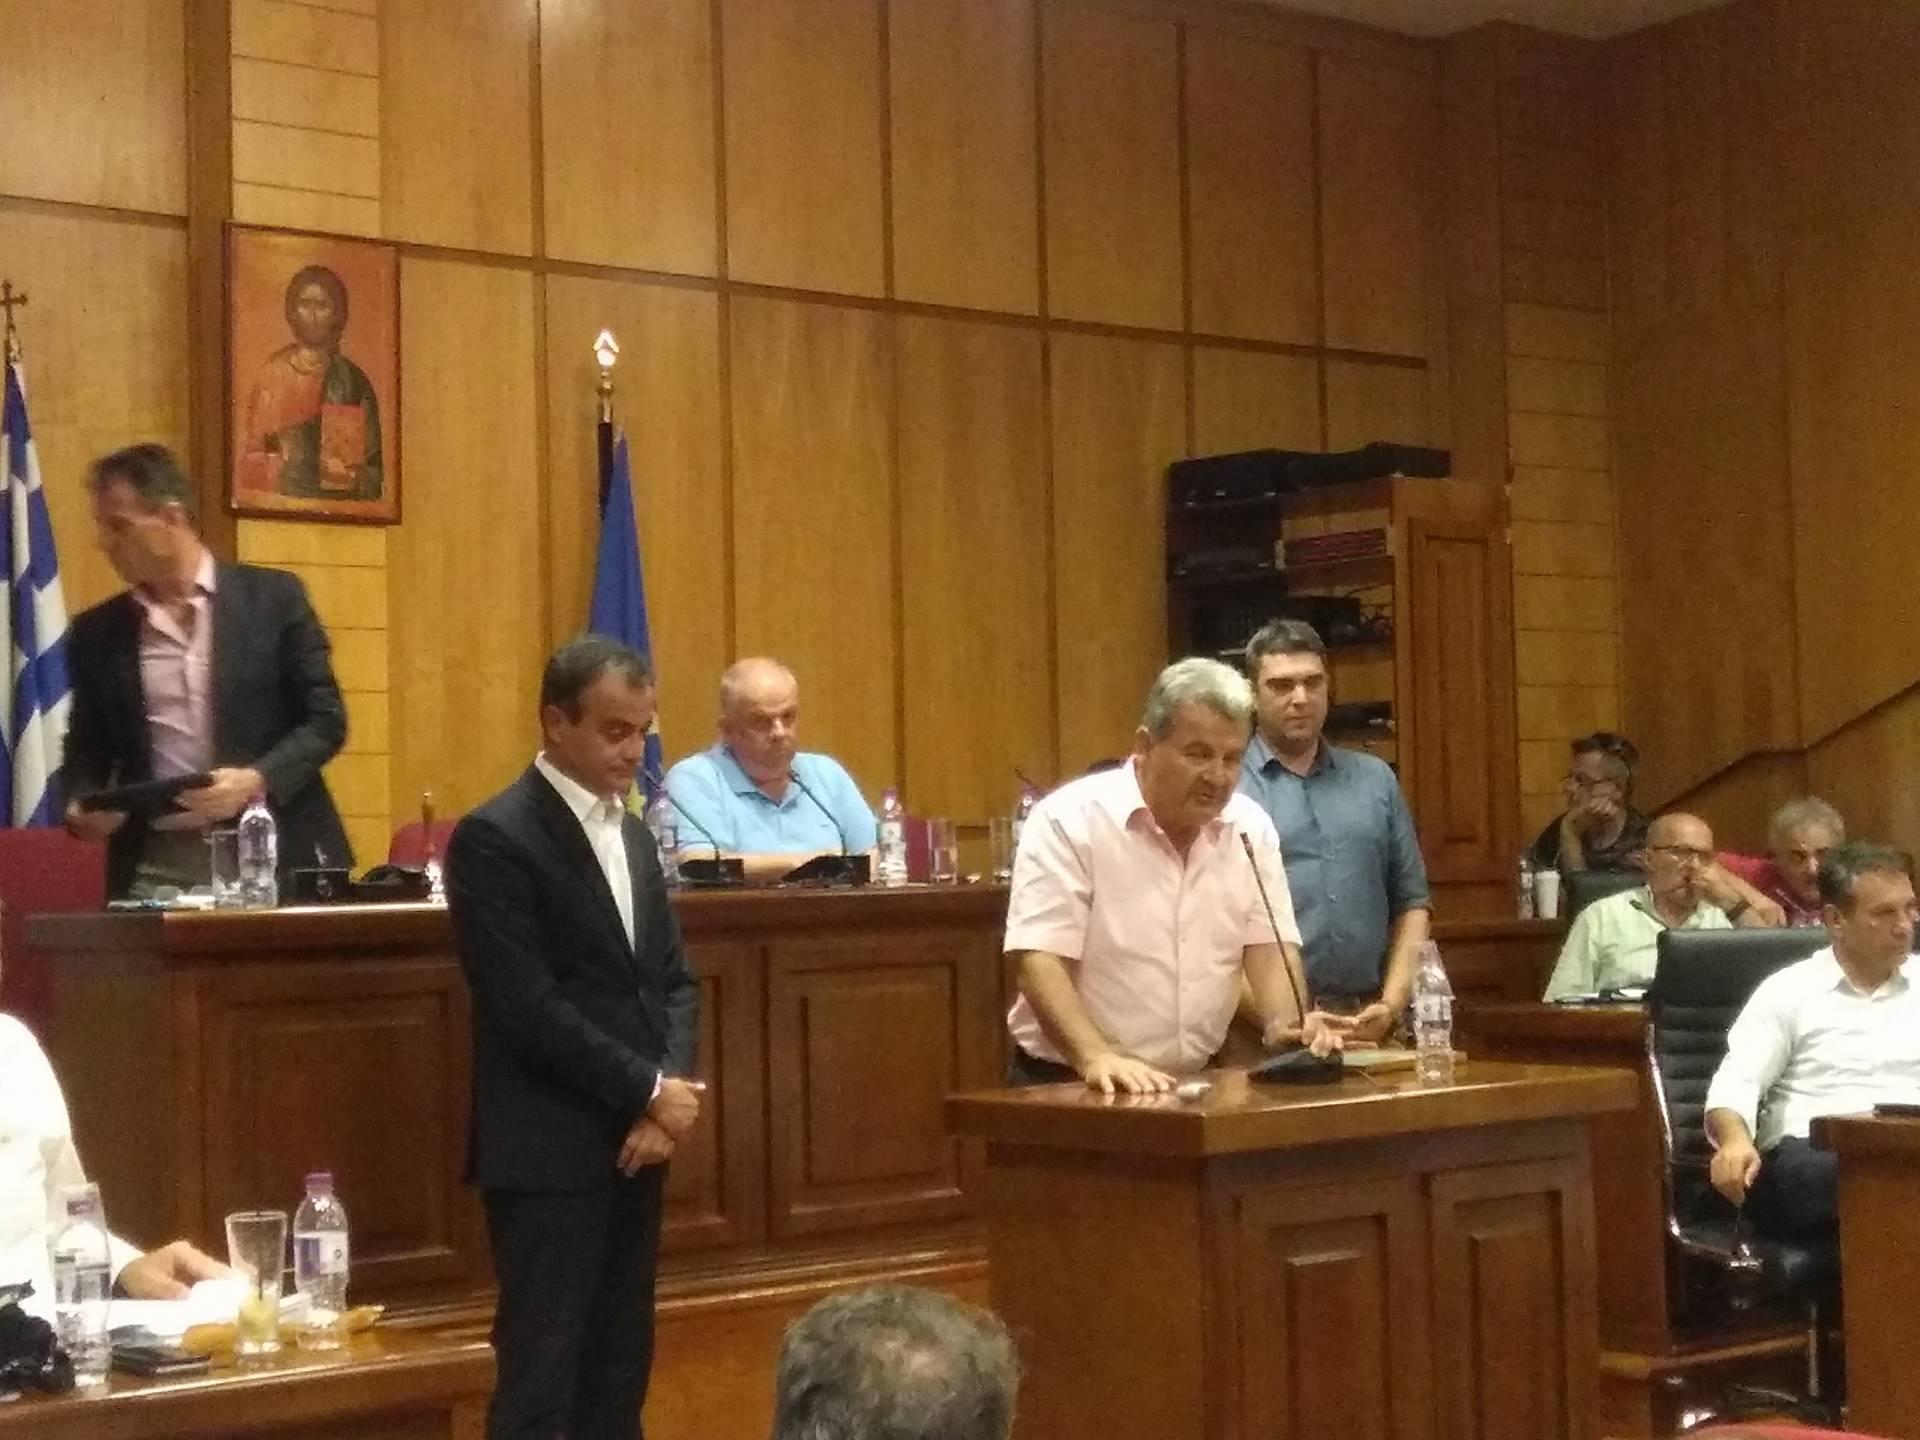 kozan.gr: Περιφερειακό Συμβούλιο Δ. Μακεδονίας: Βραβεύτηκε ο Αγροτικός Συνεταιρισμός Eλιάς Ιμέρων (Φωτογραφίες & Bίντεο)